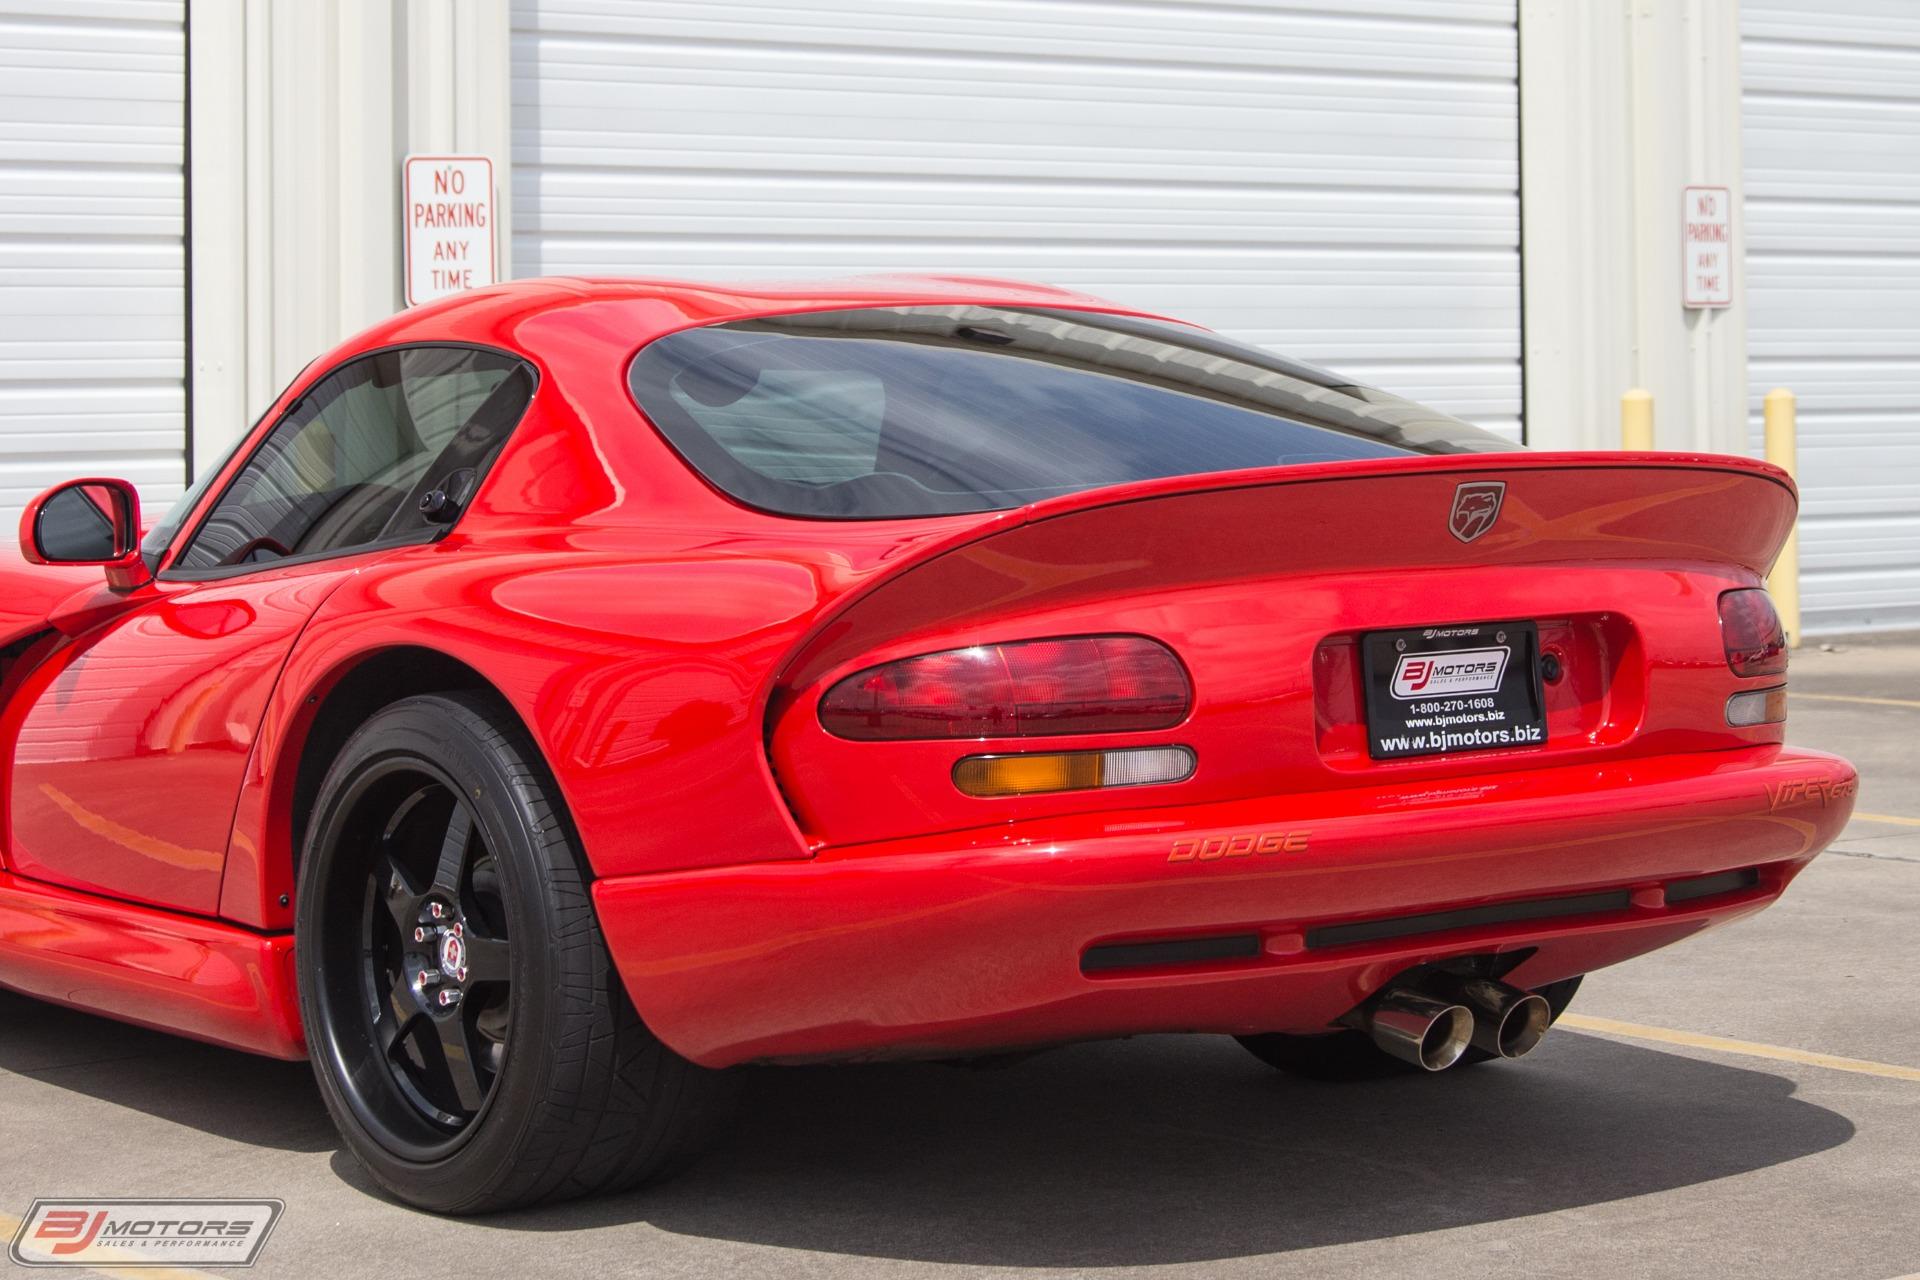 Used-1997-Dodge-Viper-GTS